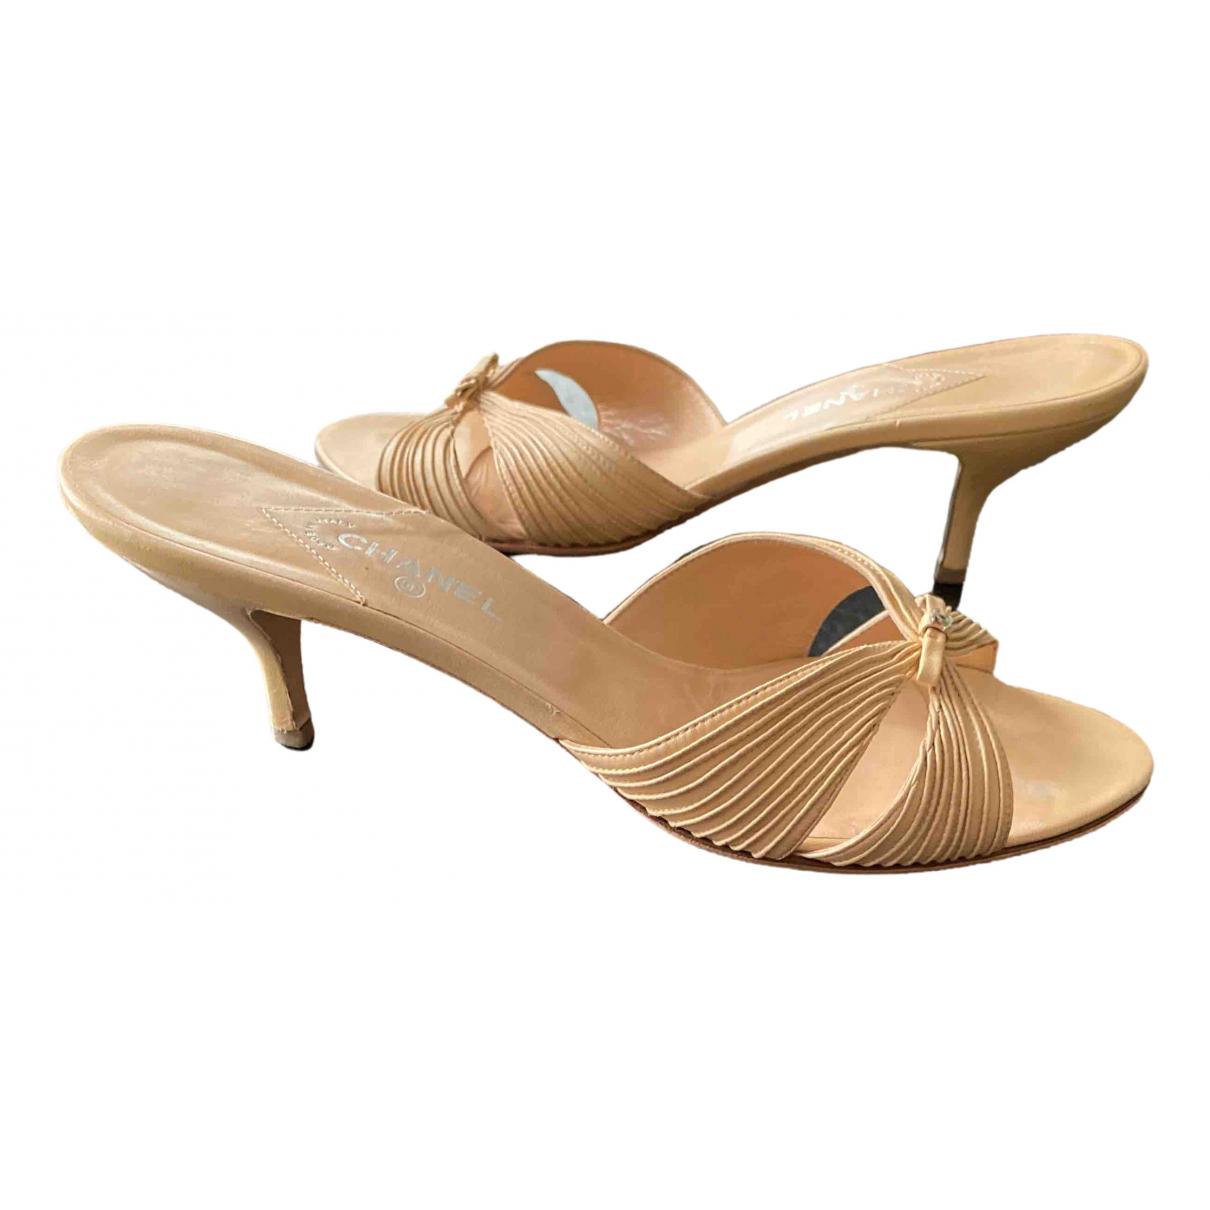 Chanel \N Beige Leather Sandals for Women 40.5 EU